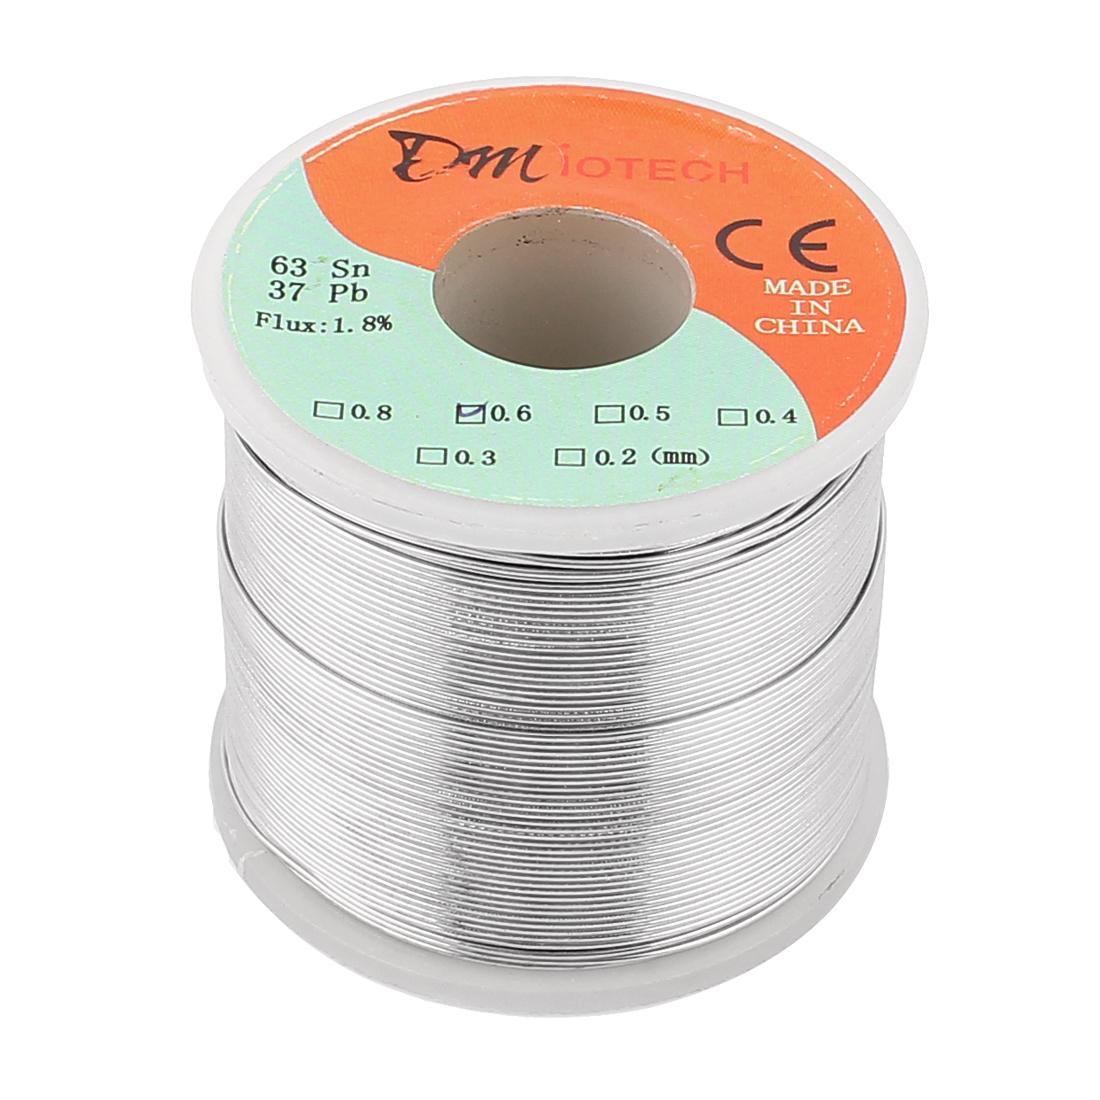 DMiotech 0.6mm 400G 63/37 Rosin Core Flux 1.8% Tin  Roll Soldering Wire